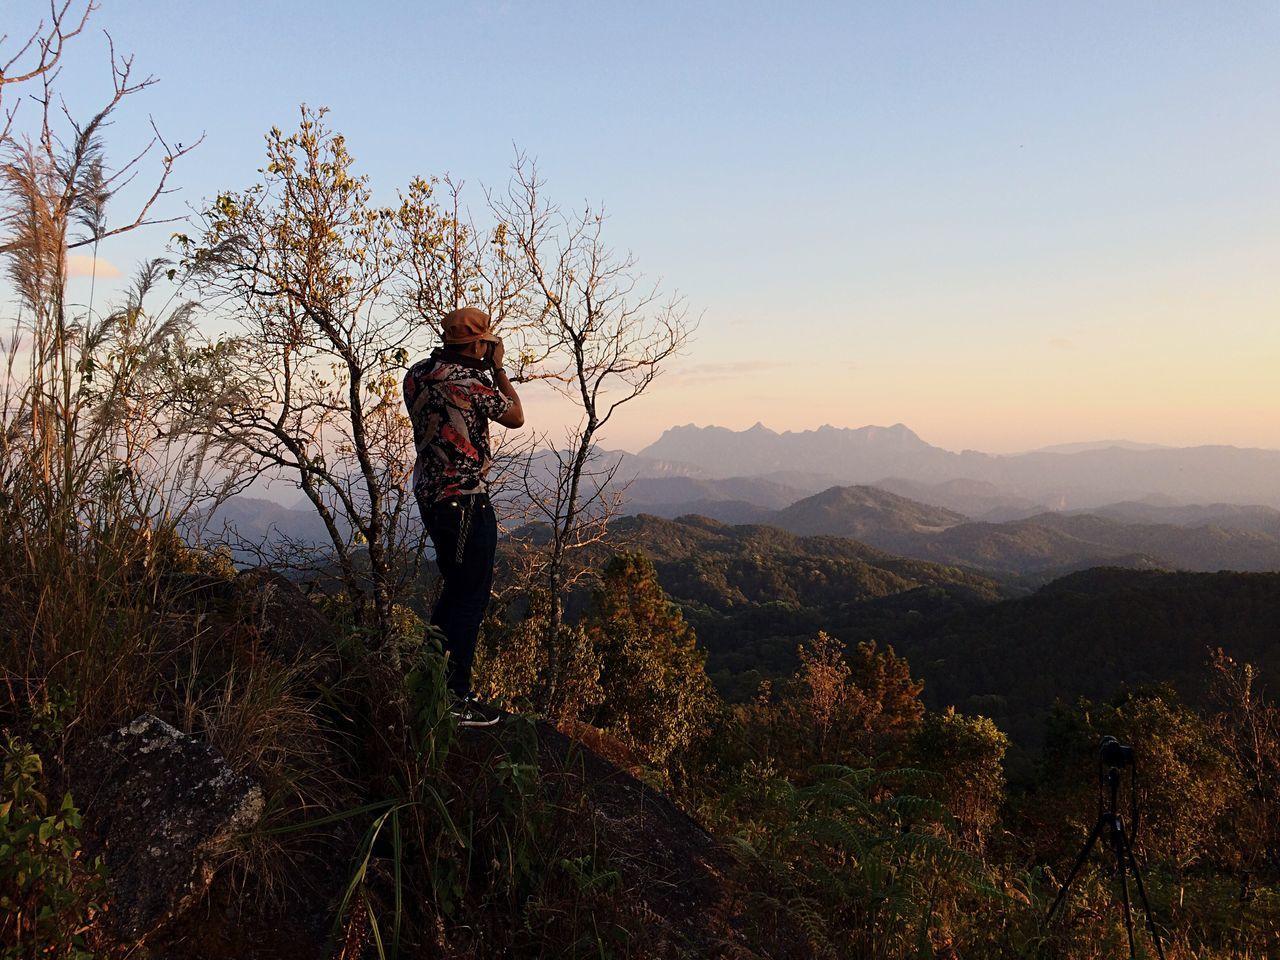 Miles Away Chiang Mai | Thailand Chiang Mai Chiang Dao Trekking Mountain Mountain View Mountain Peak Journey Outdoors Outdoor Photography Adventure Hiking Nature Scenics Photographer